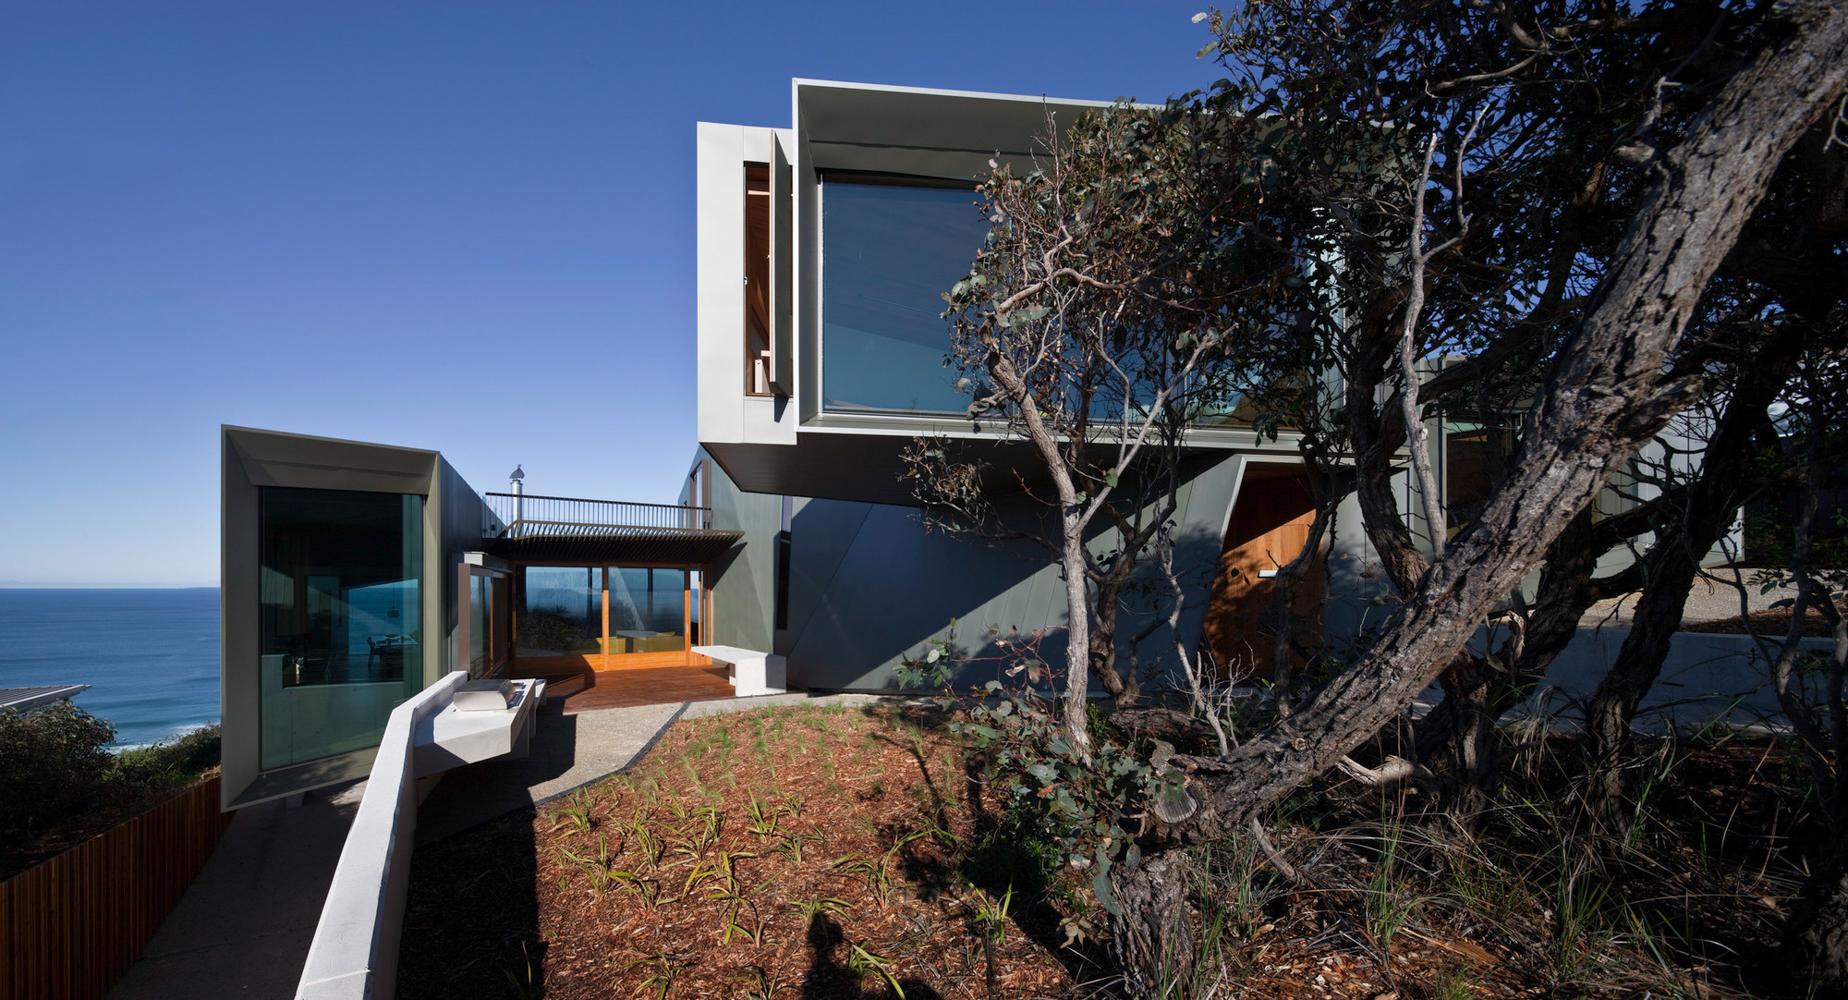 fairhaven-beach-house-john-wardle-architects-the-design-emotive-05.jpg